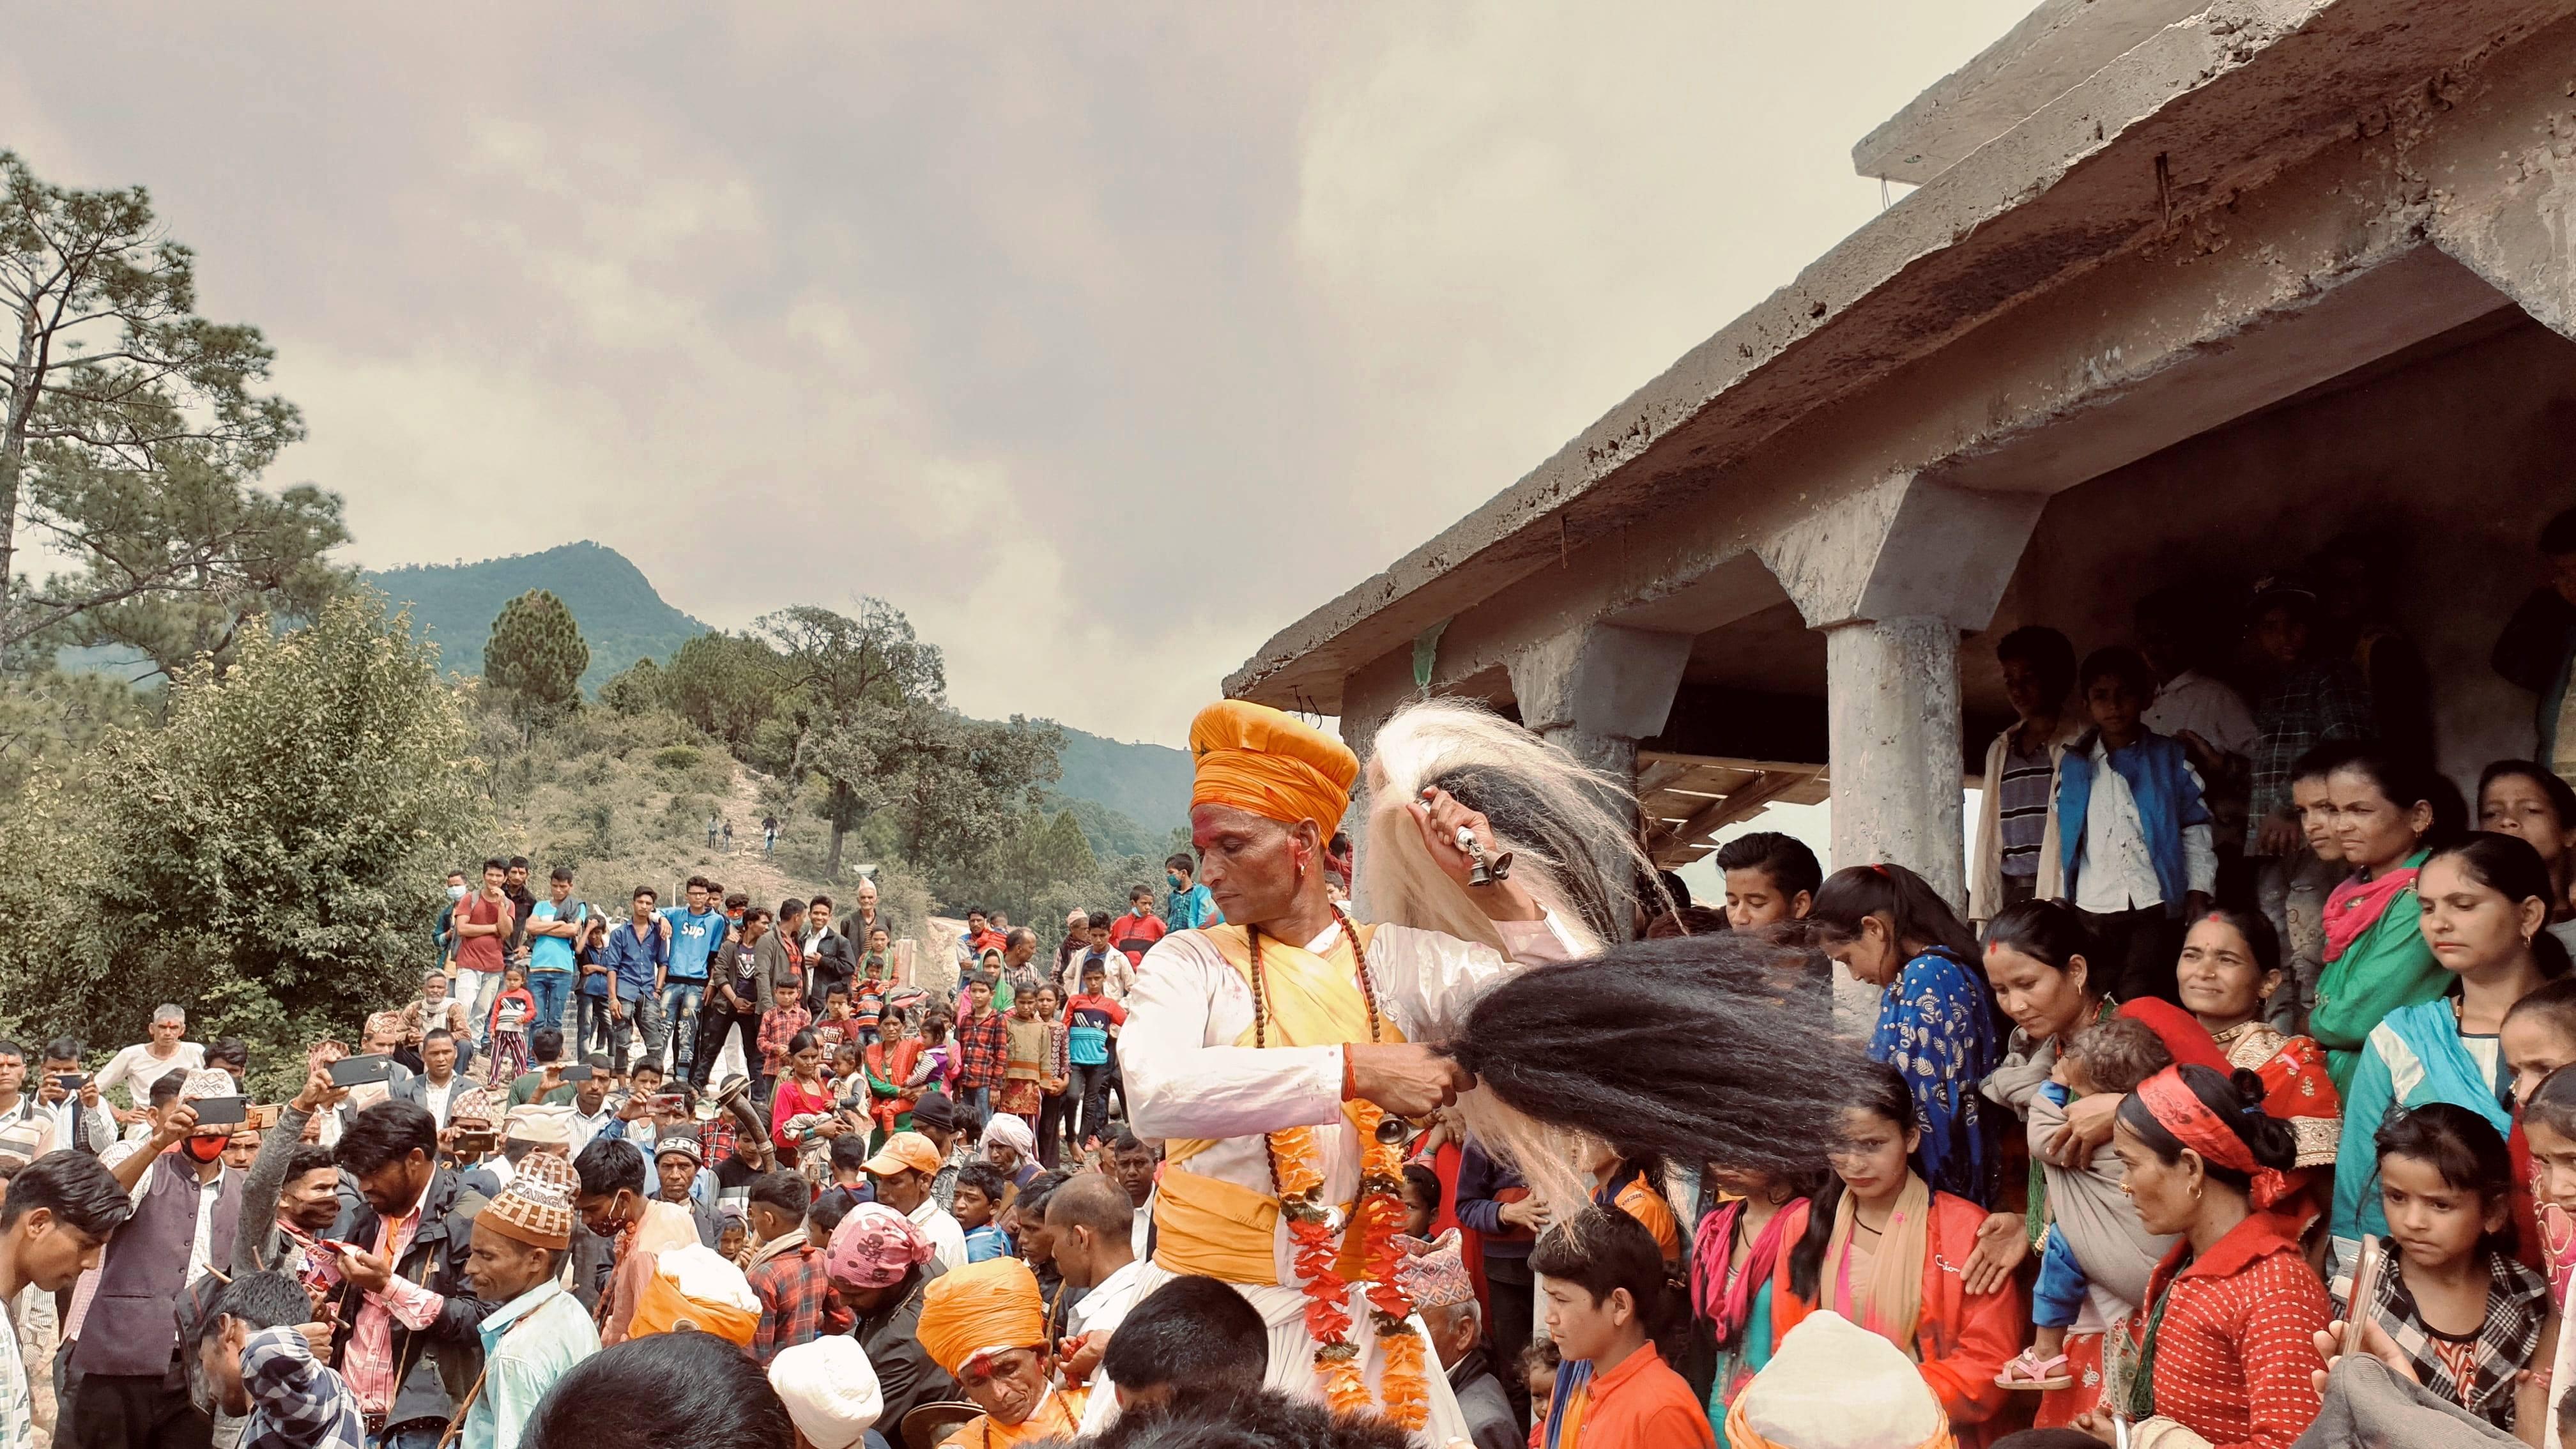 A main priest (Mul Dhaami) worshipping Bandali God by performing rituals during Shrawan Poornima (full moon day in Shrawan). The photo was taken in Ghegad village, Achham.